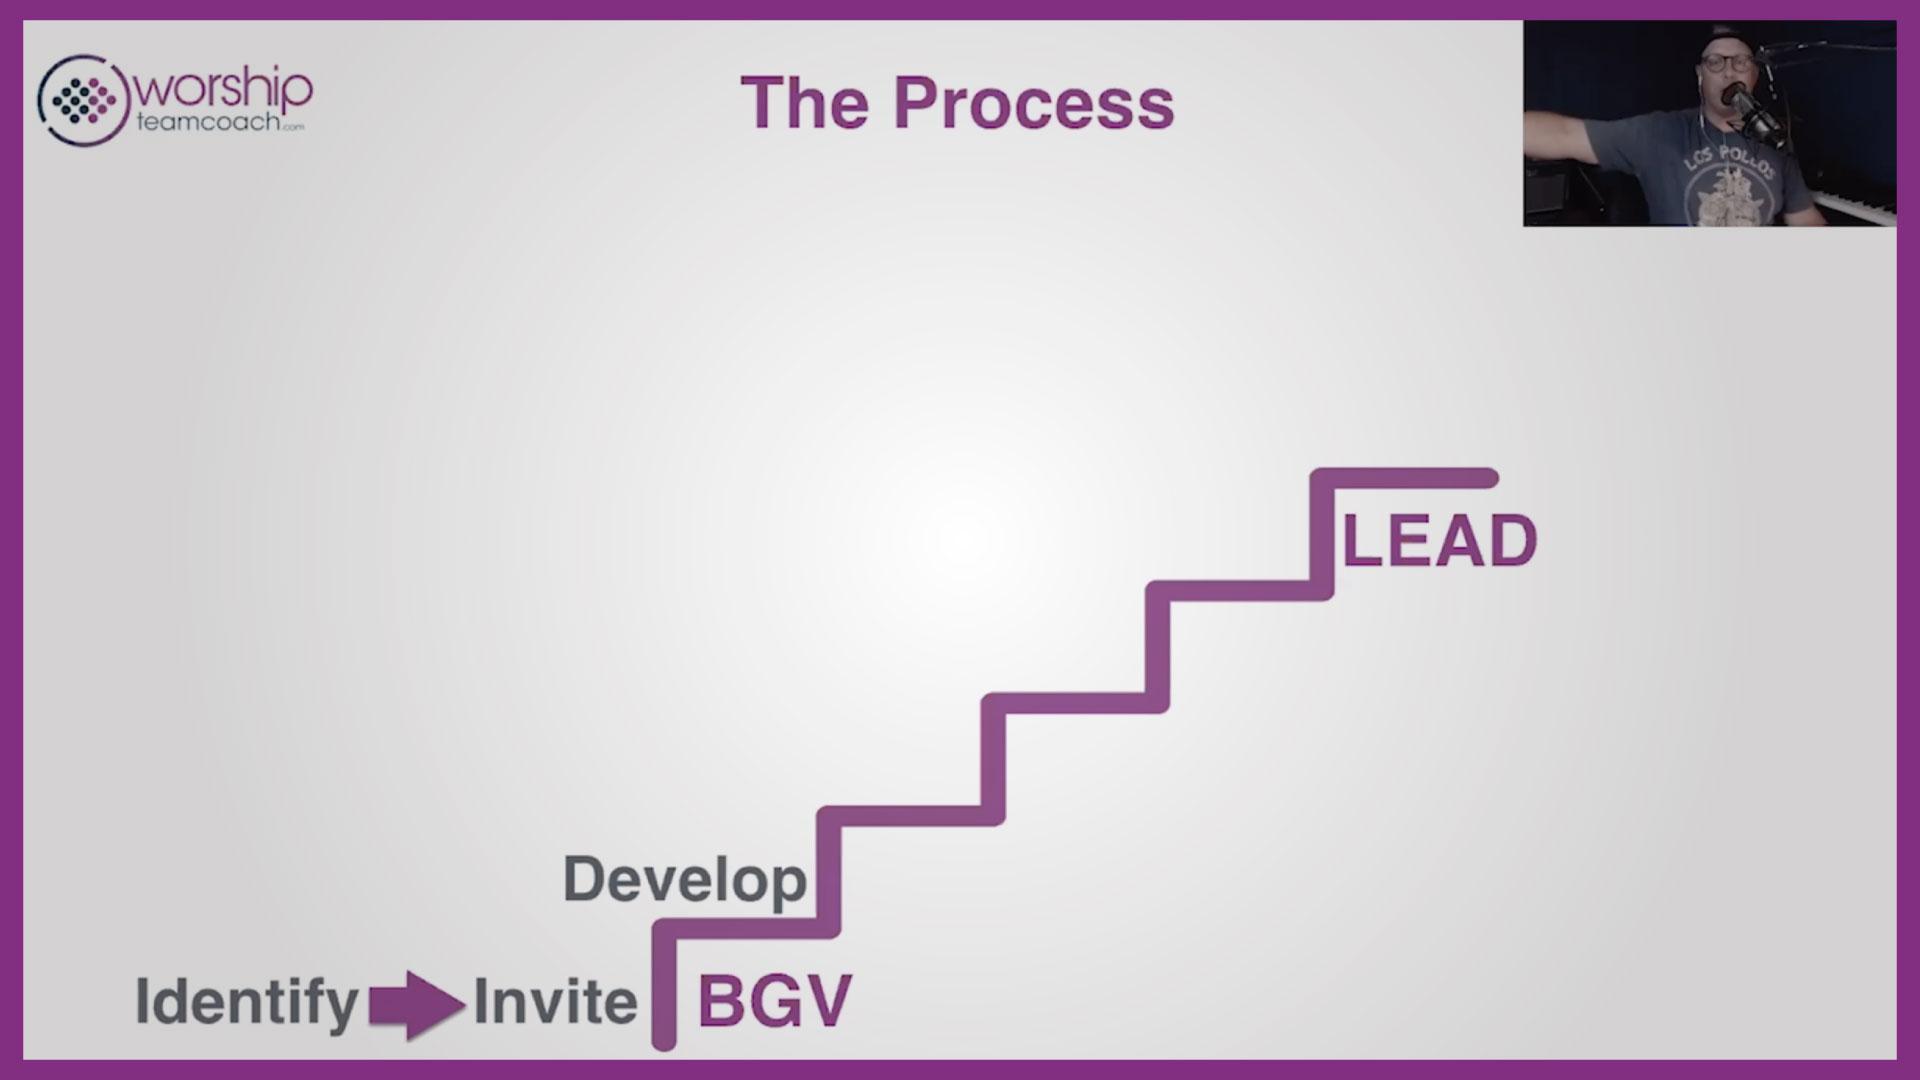 bgv-lead_replay-screenshot